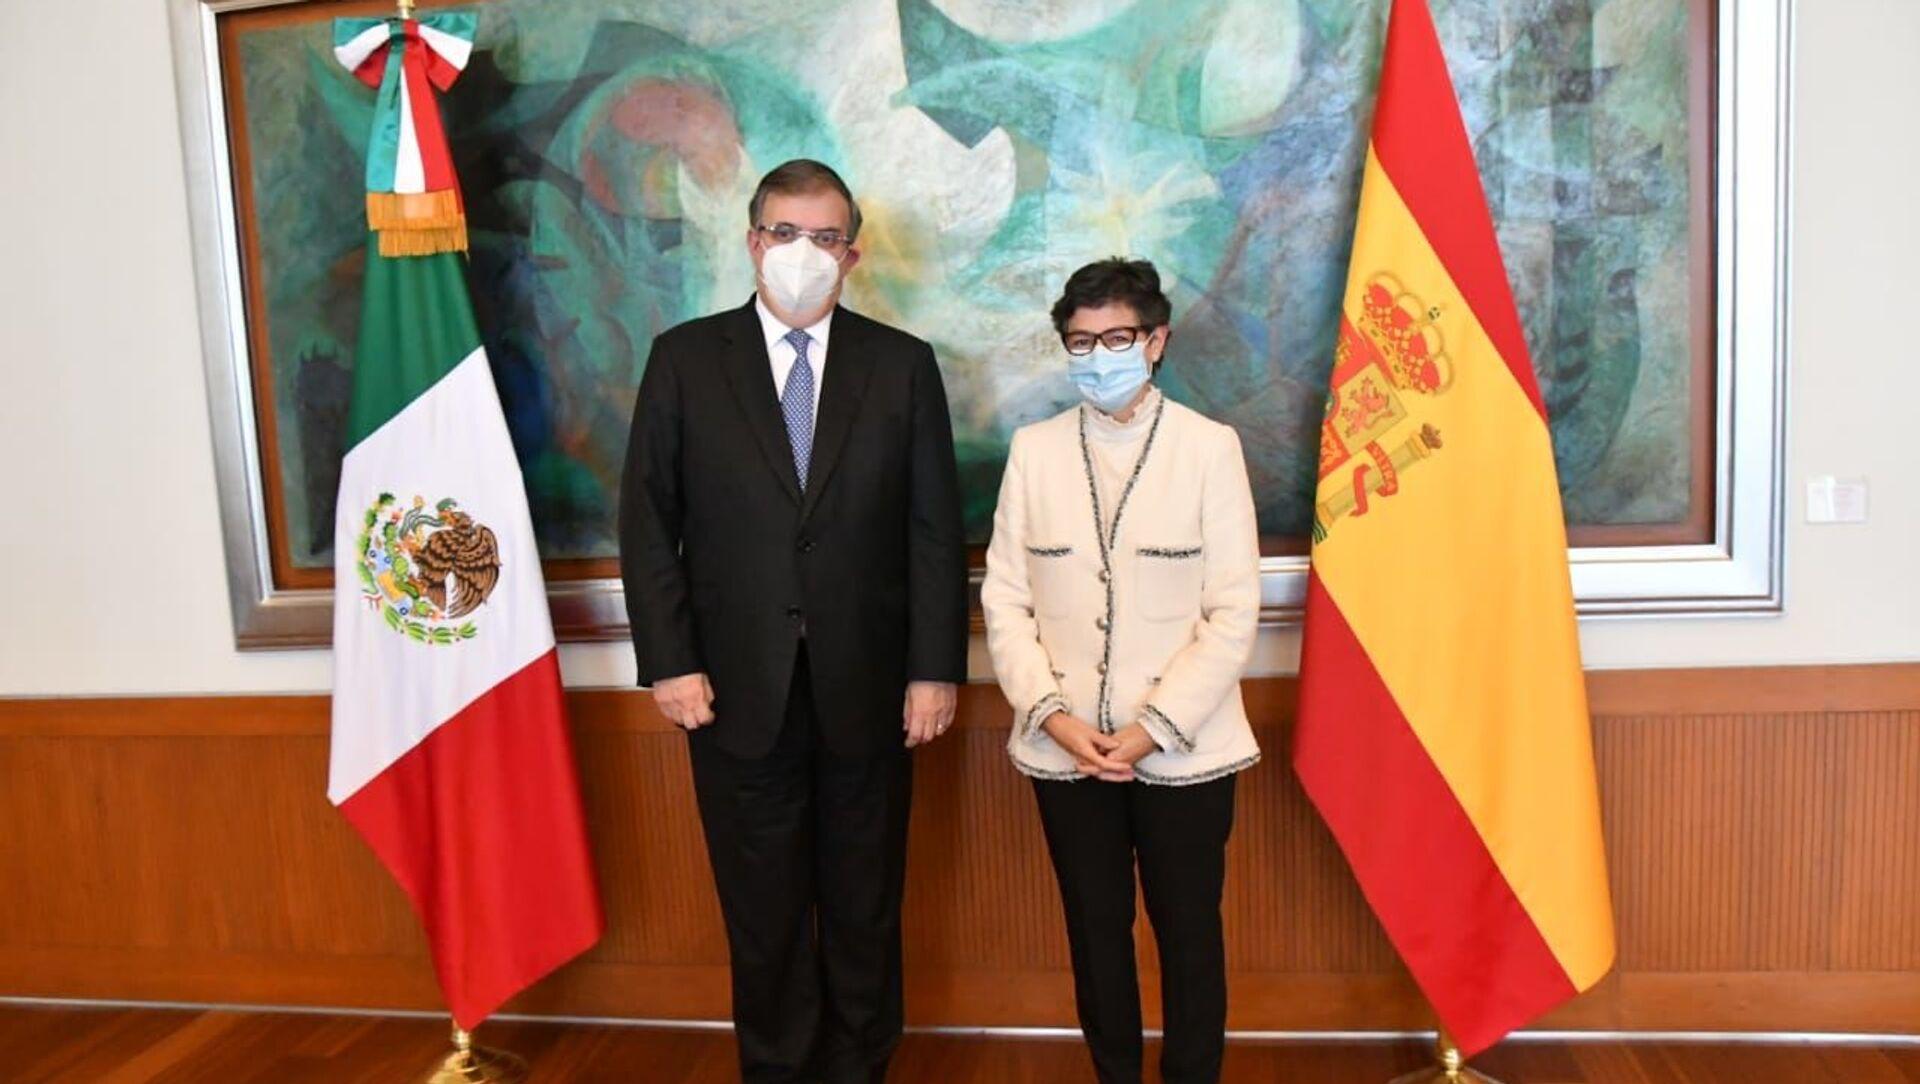 La canciller de España, Arancha González Laya, junto a su homólogo mexicano, Marcelo Ebrard - Sputnik Mundo, 1920, 18.11.2020